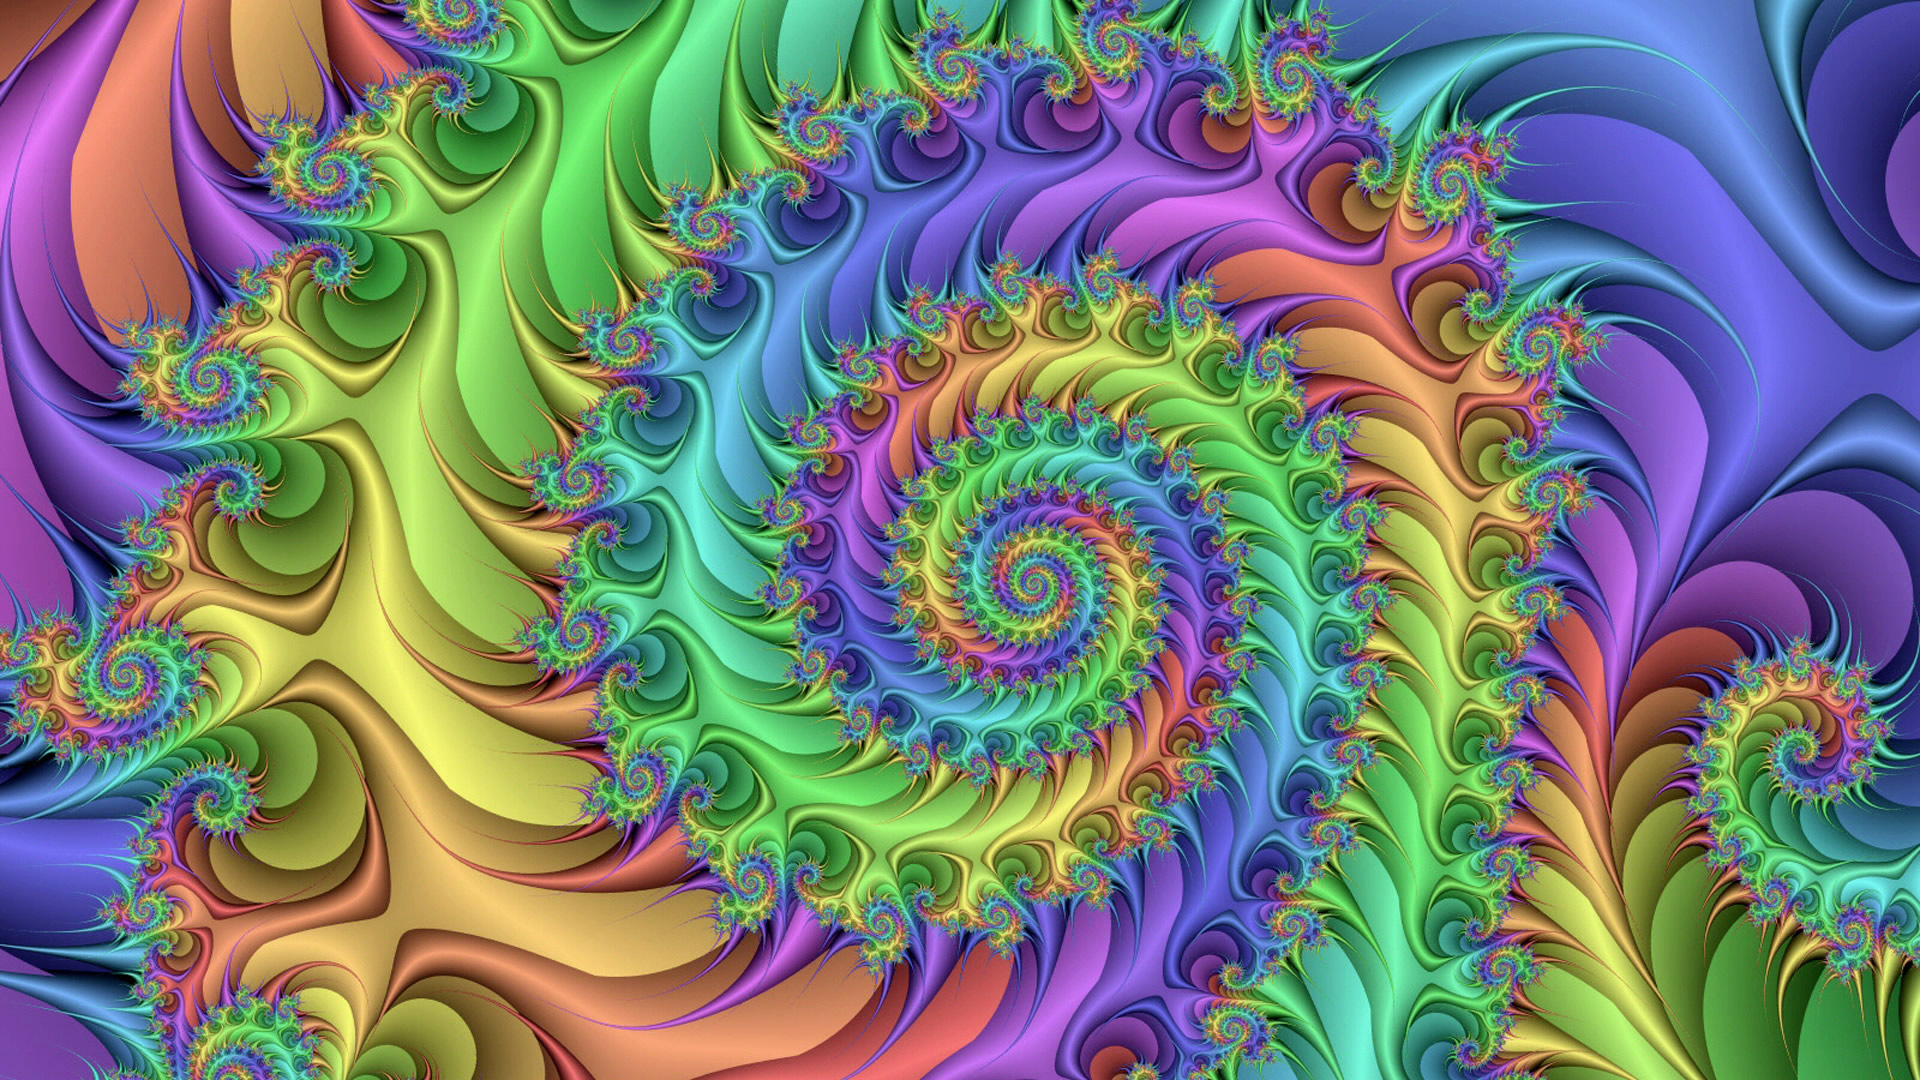 Trippy Wallpapers Hd 19202151080 125071 HD Wallpaper Res 1920x1080